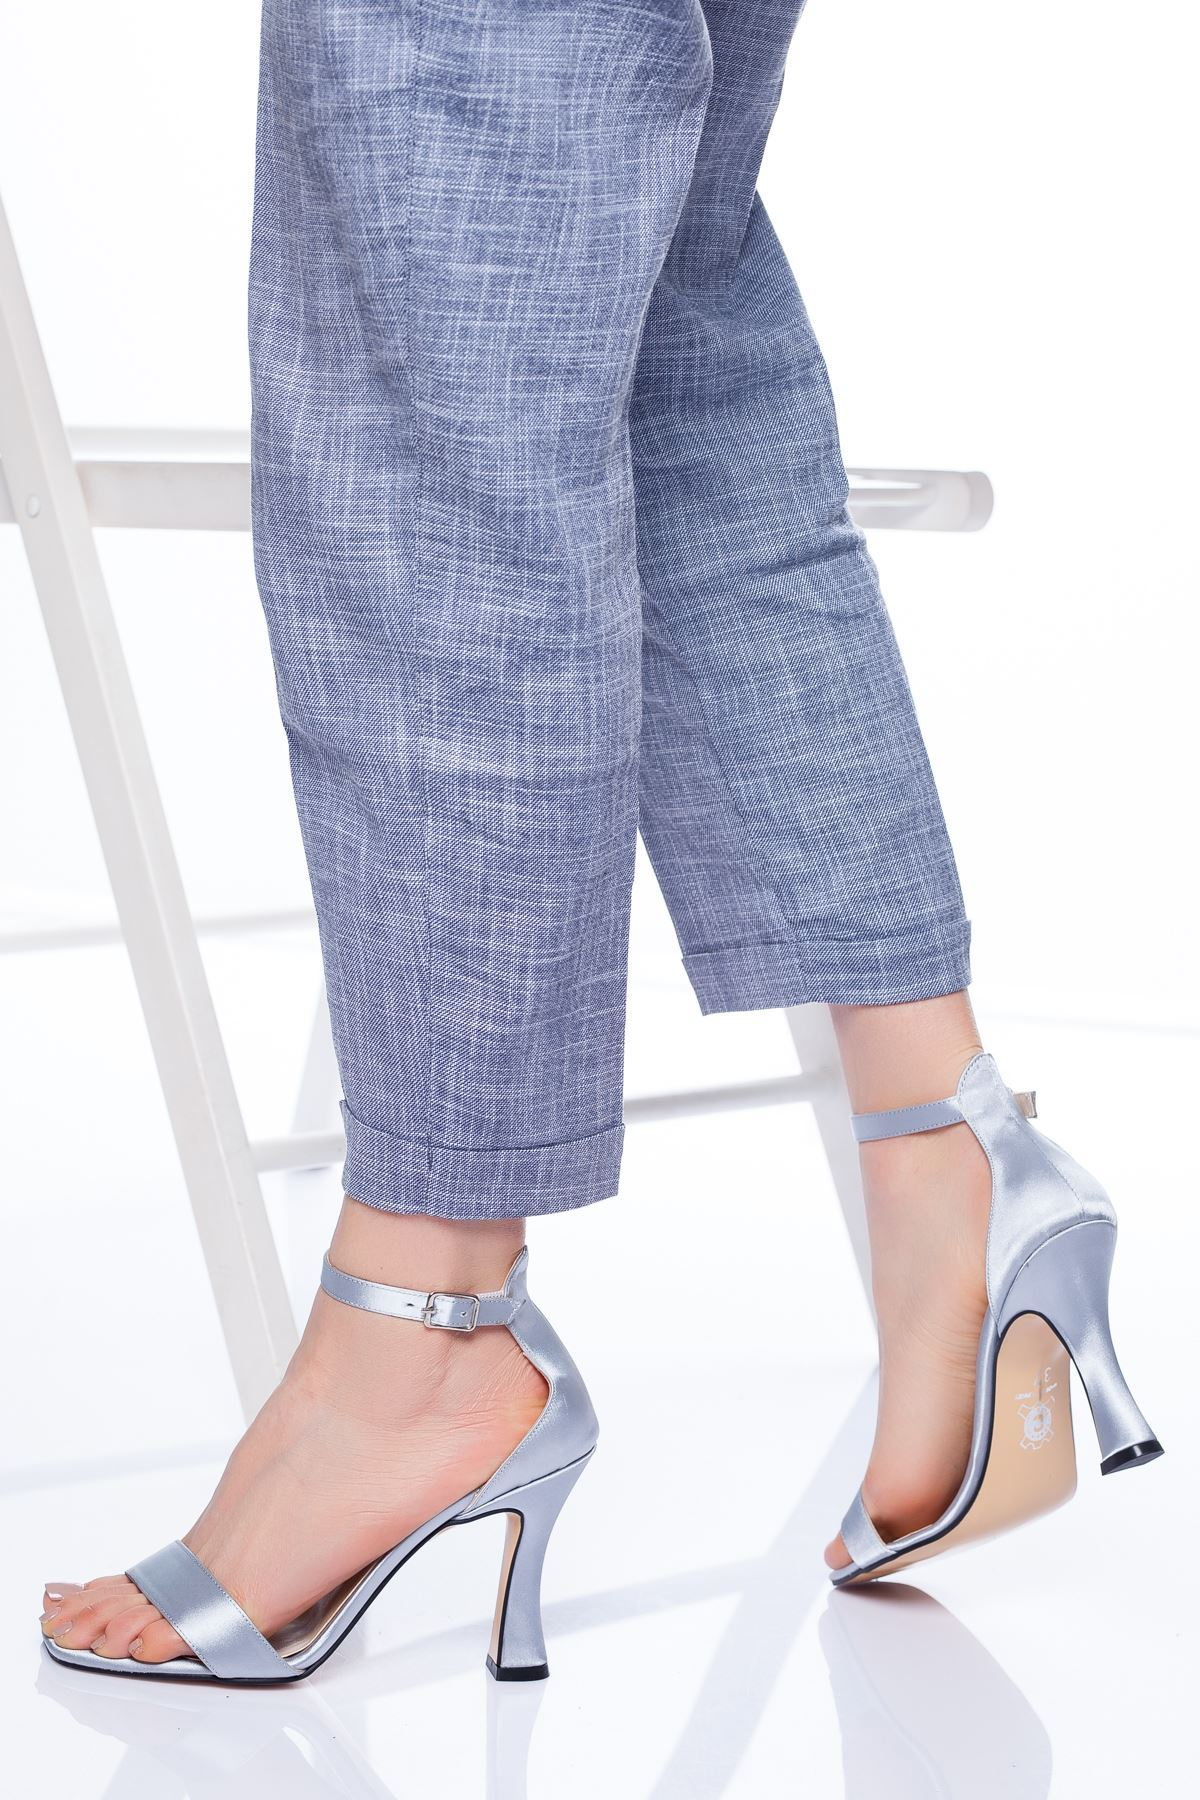 Freda Topuklu Ayakkabı GRİ